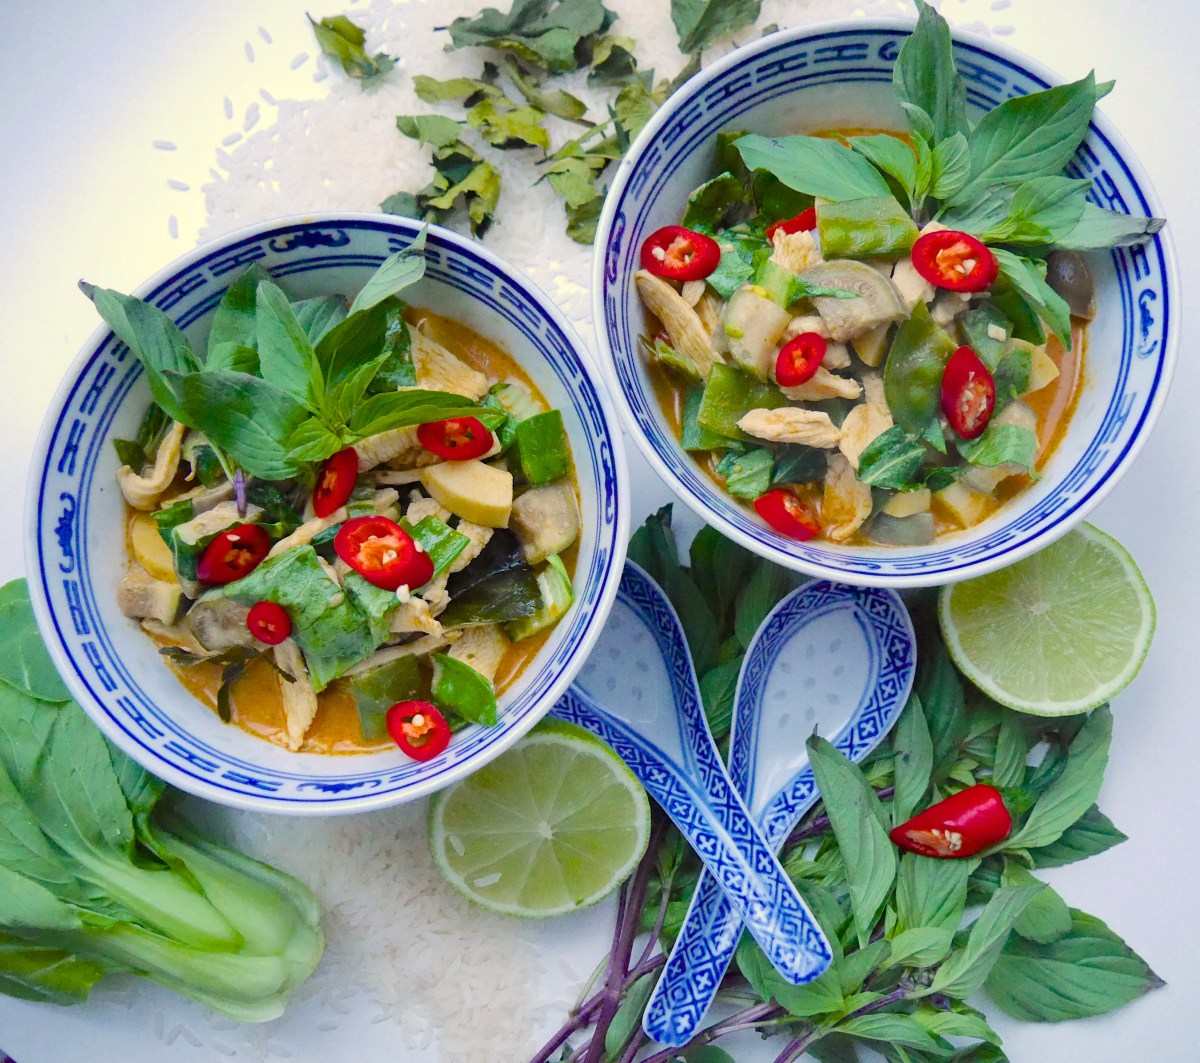 Gaeng Ped: Rotes Thai Curry mit Huhn, Bambusspitzen und Pak Choi